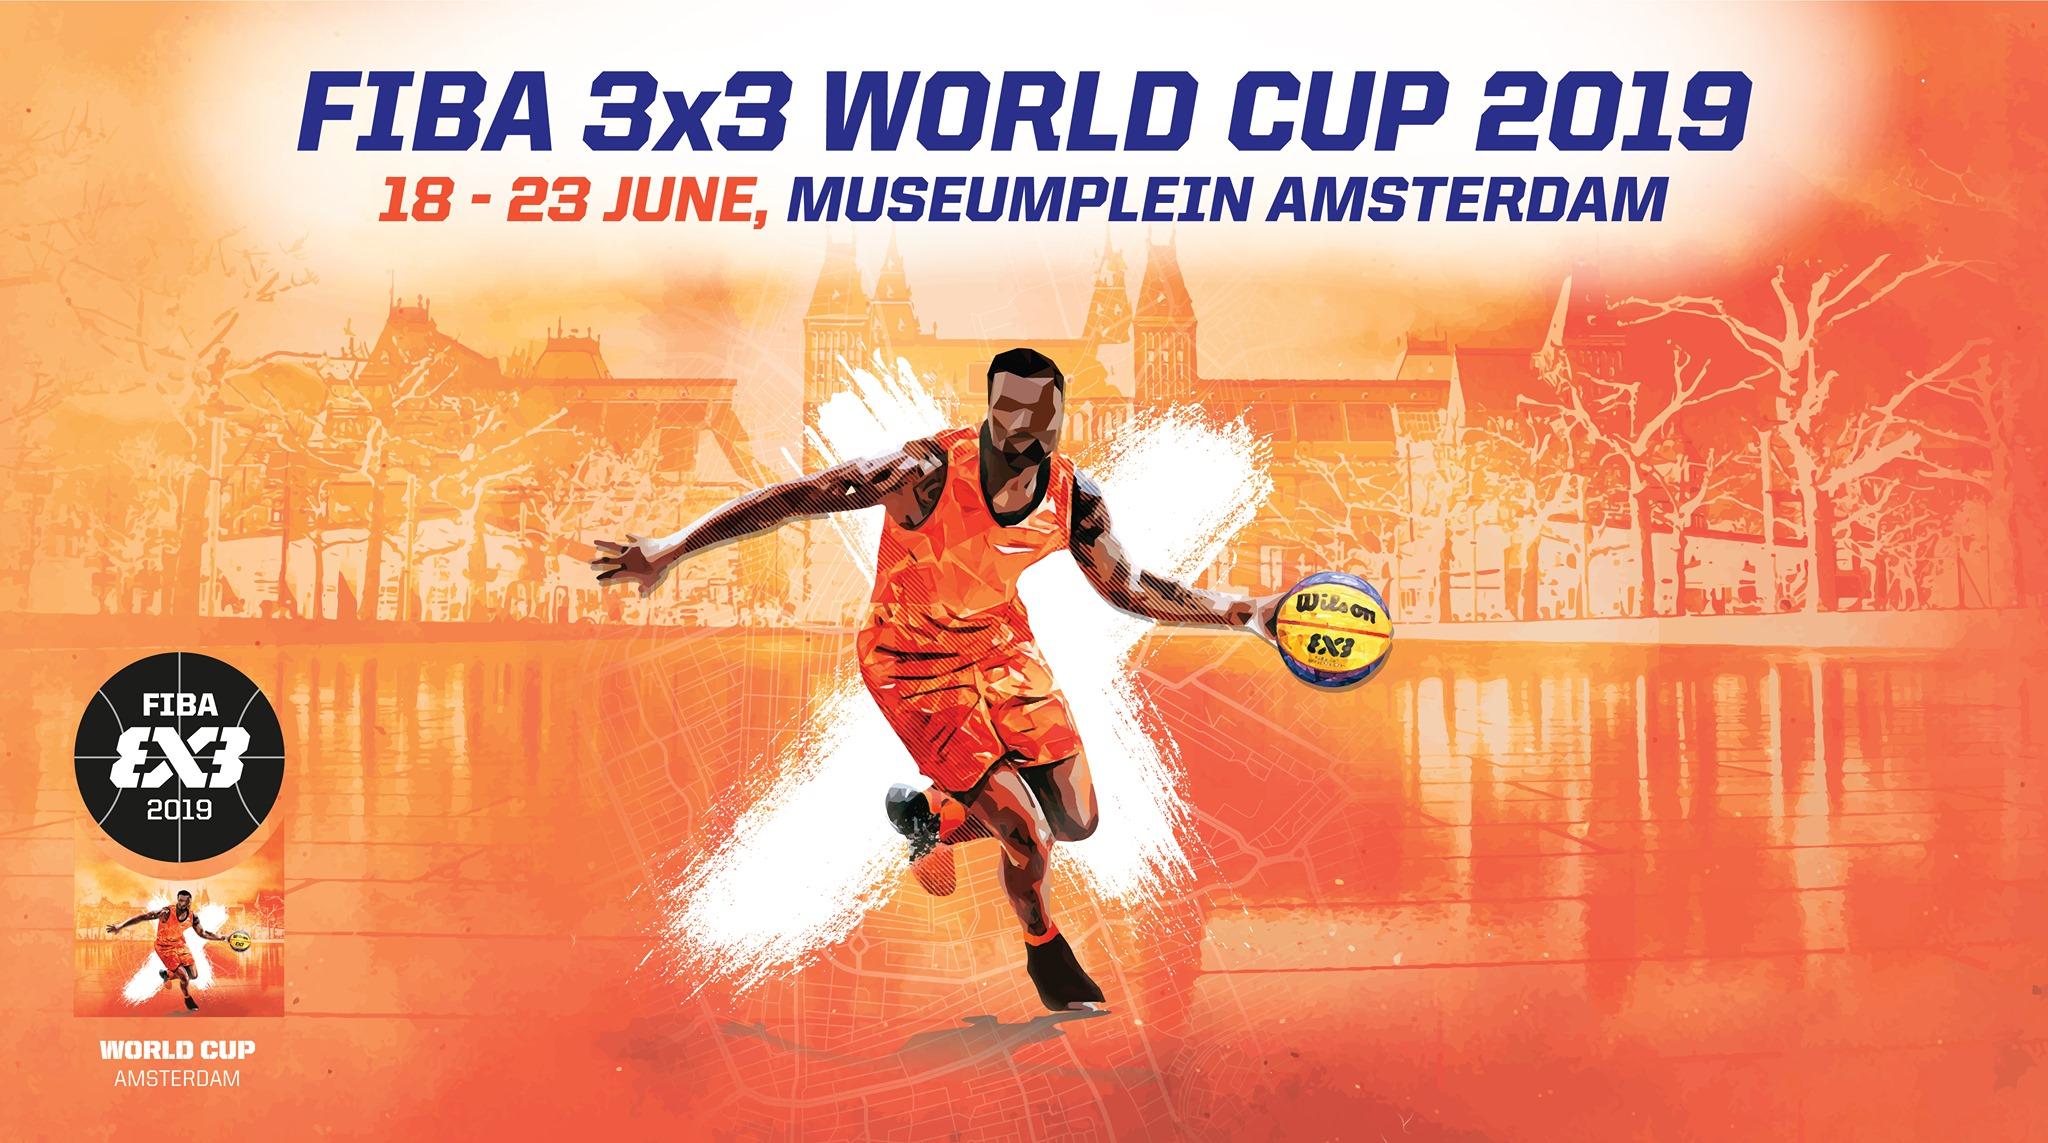 FIBA 3x3 5